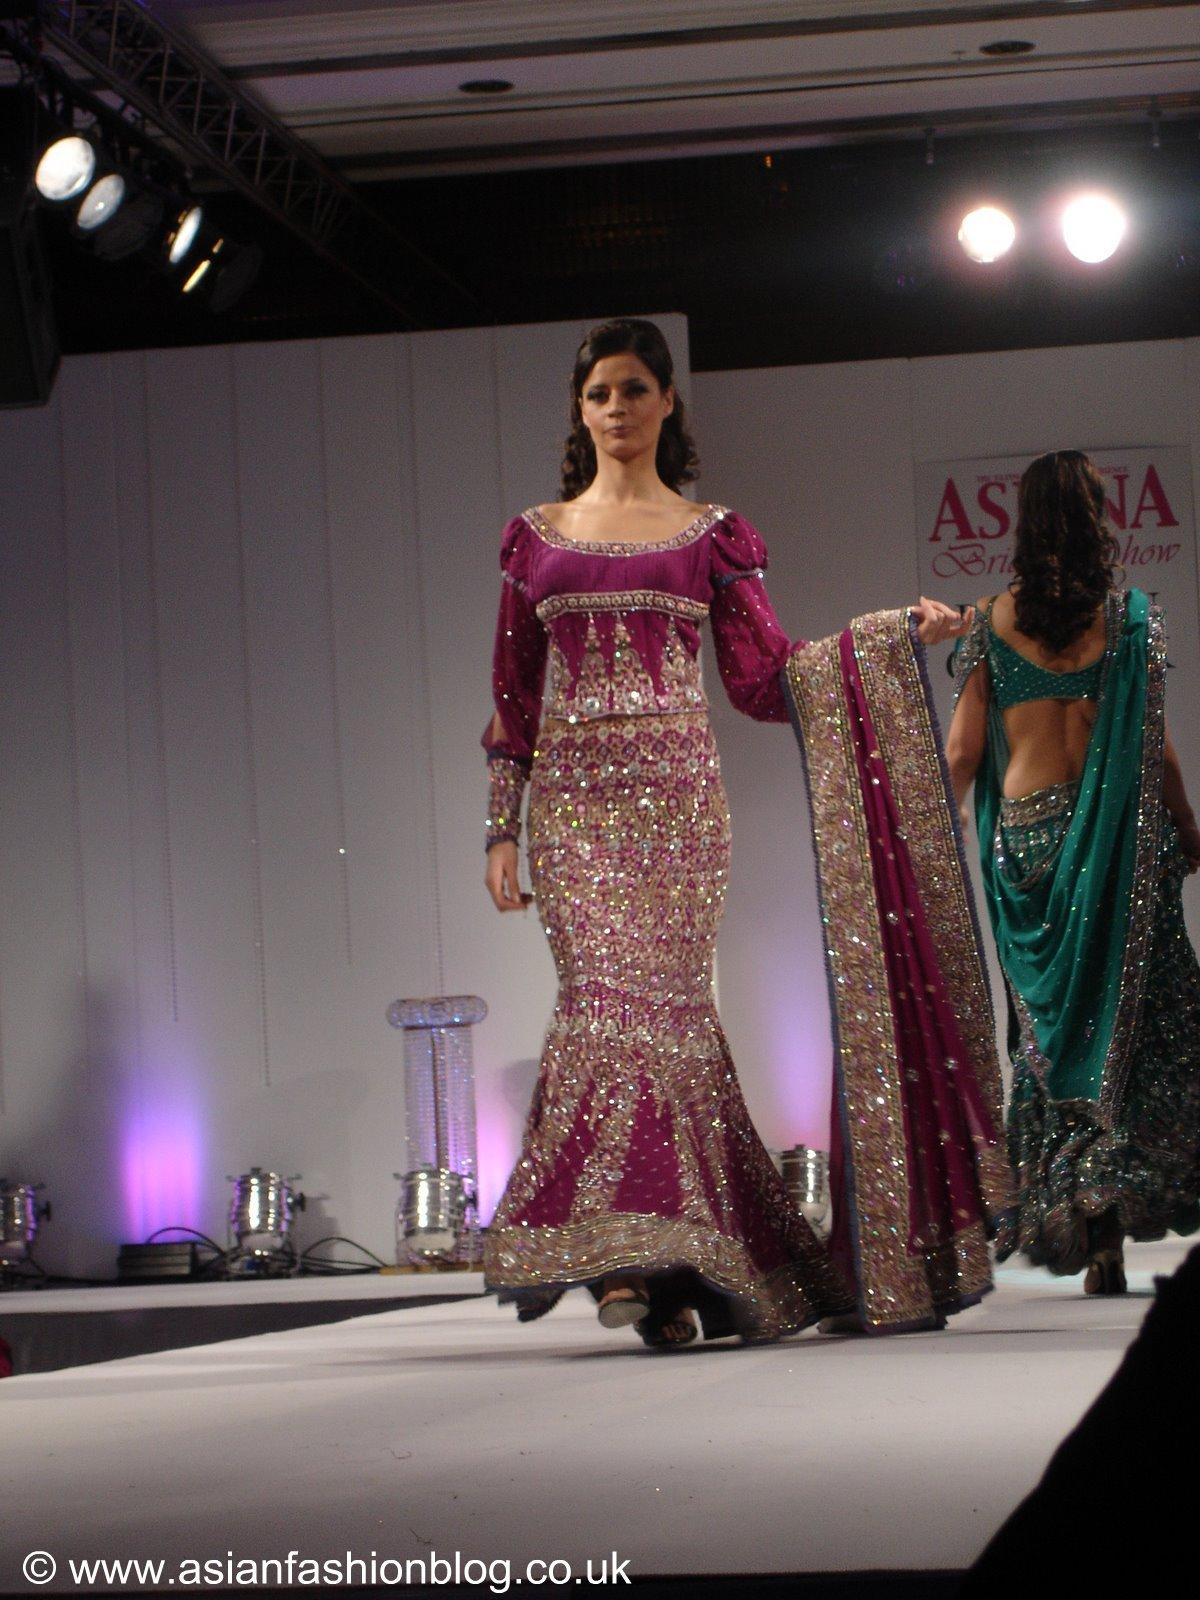 DSC05802 - Bridal Fashion Show......!!!!!!!!!!!!!!!!!